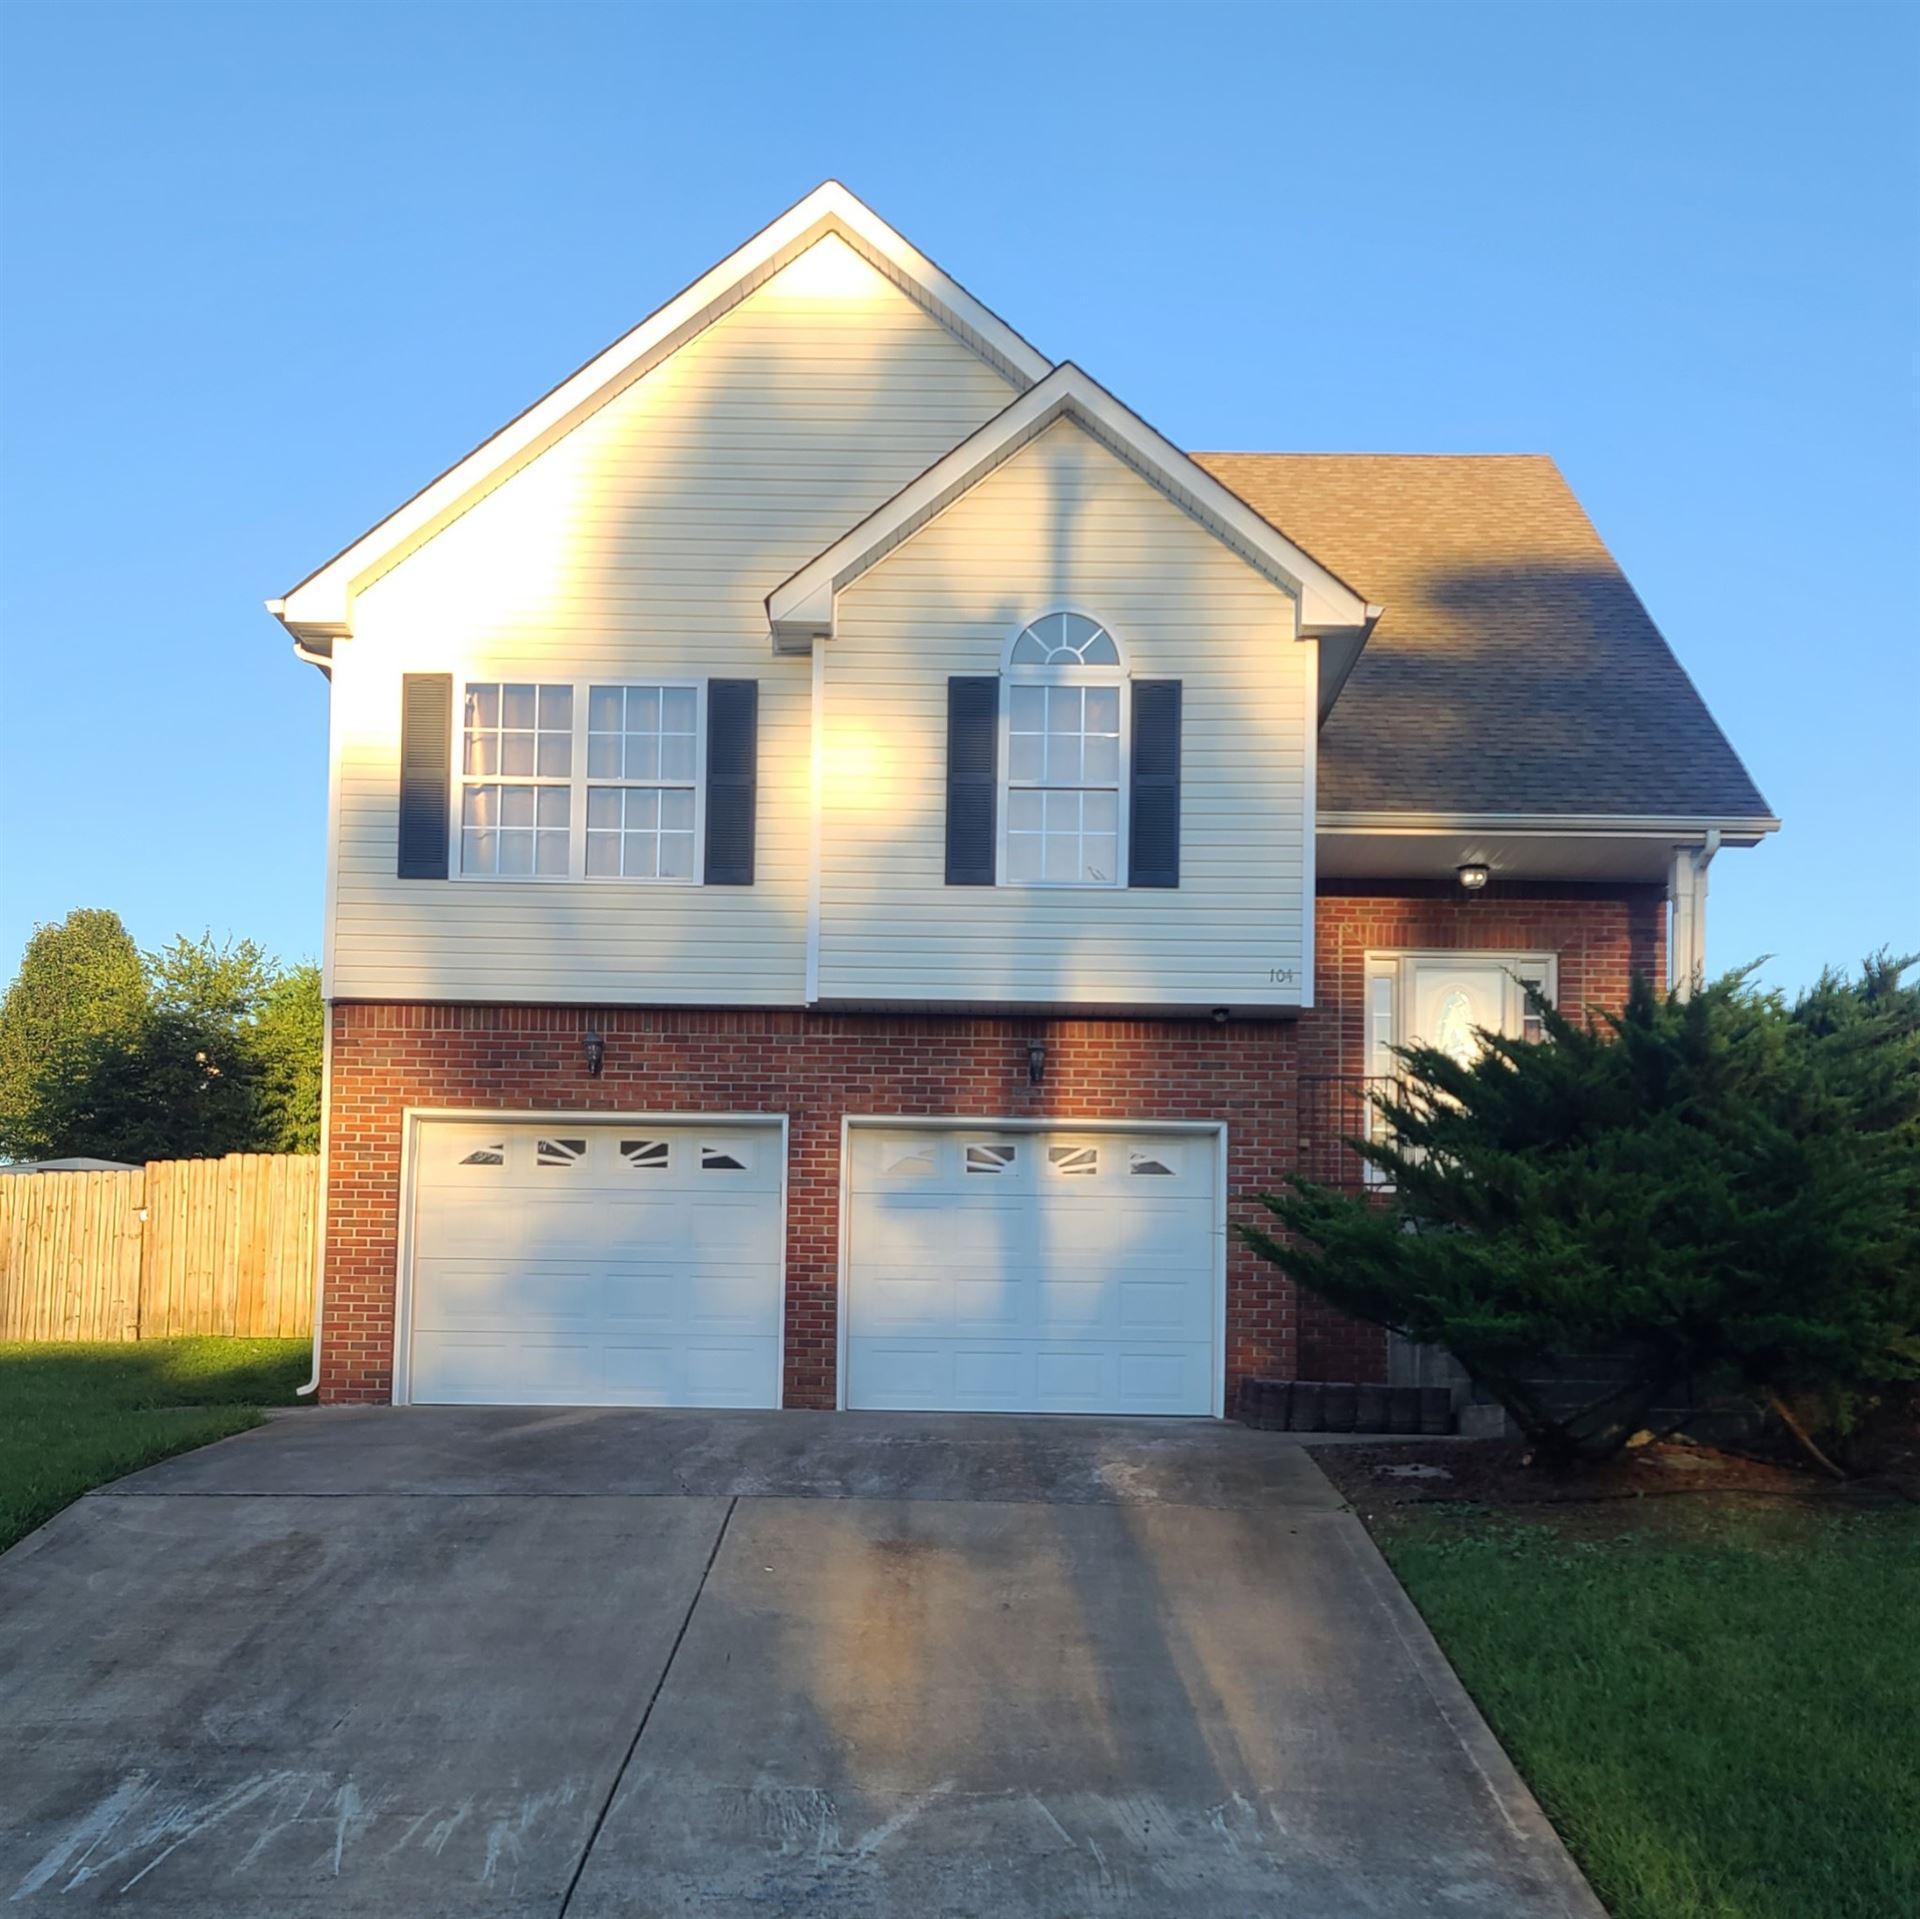 104 West Drive, Clarksville, TN 37040 - MLS#: 2294225